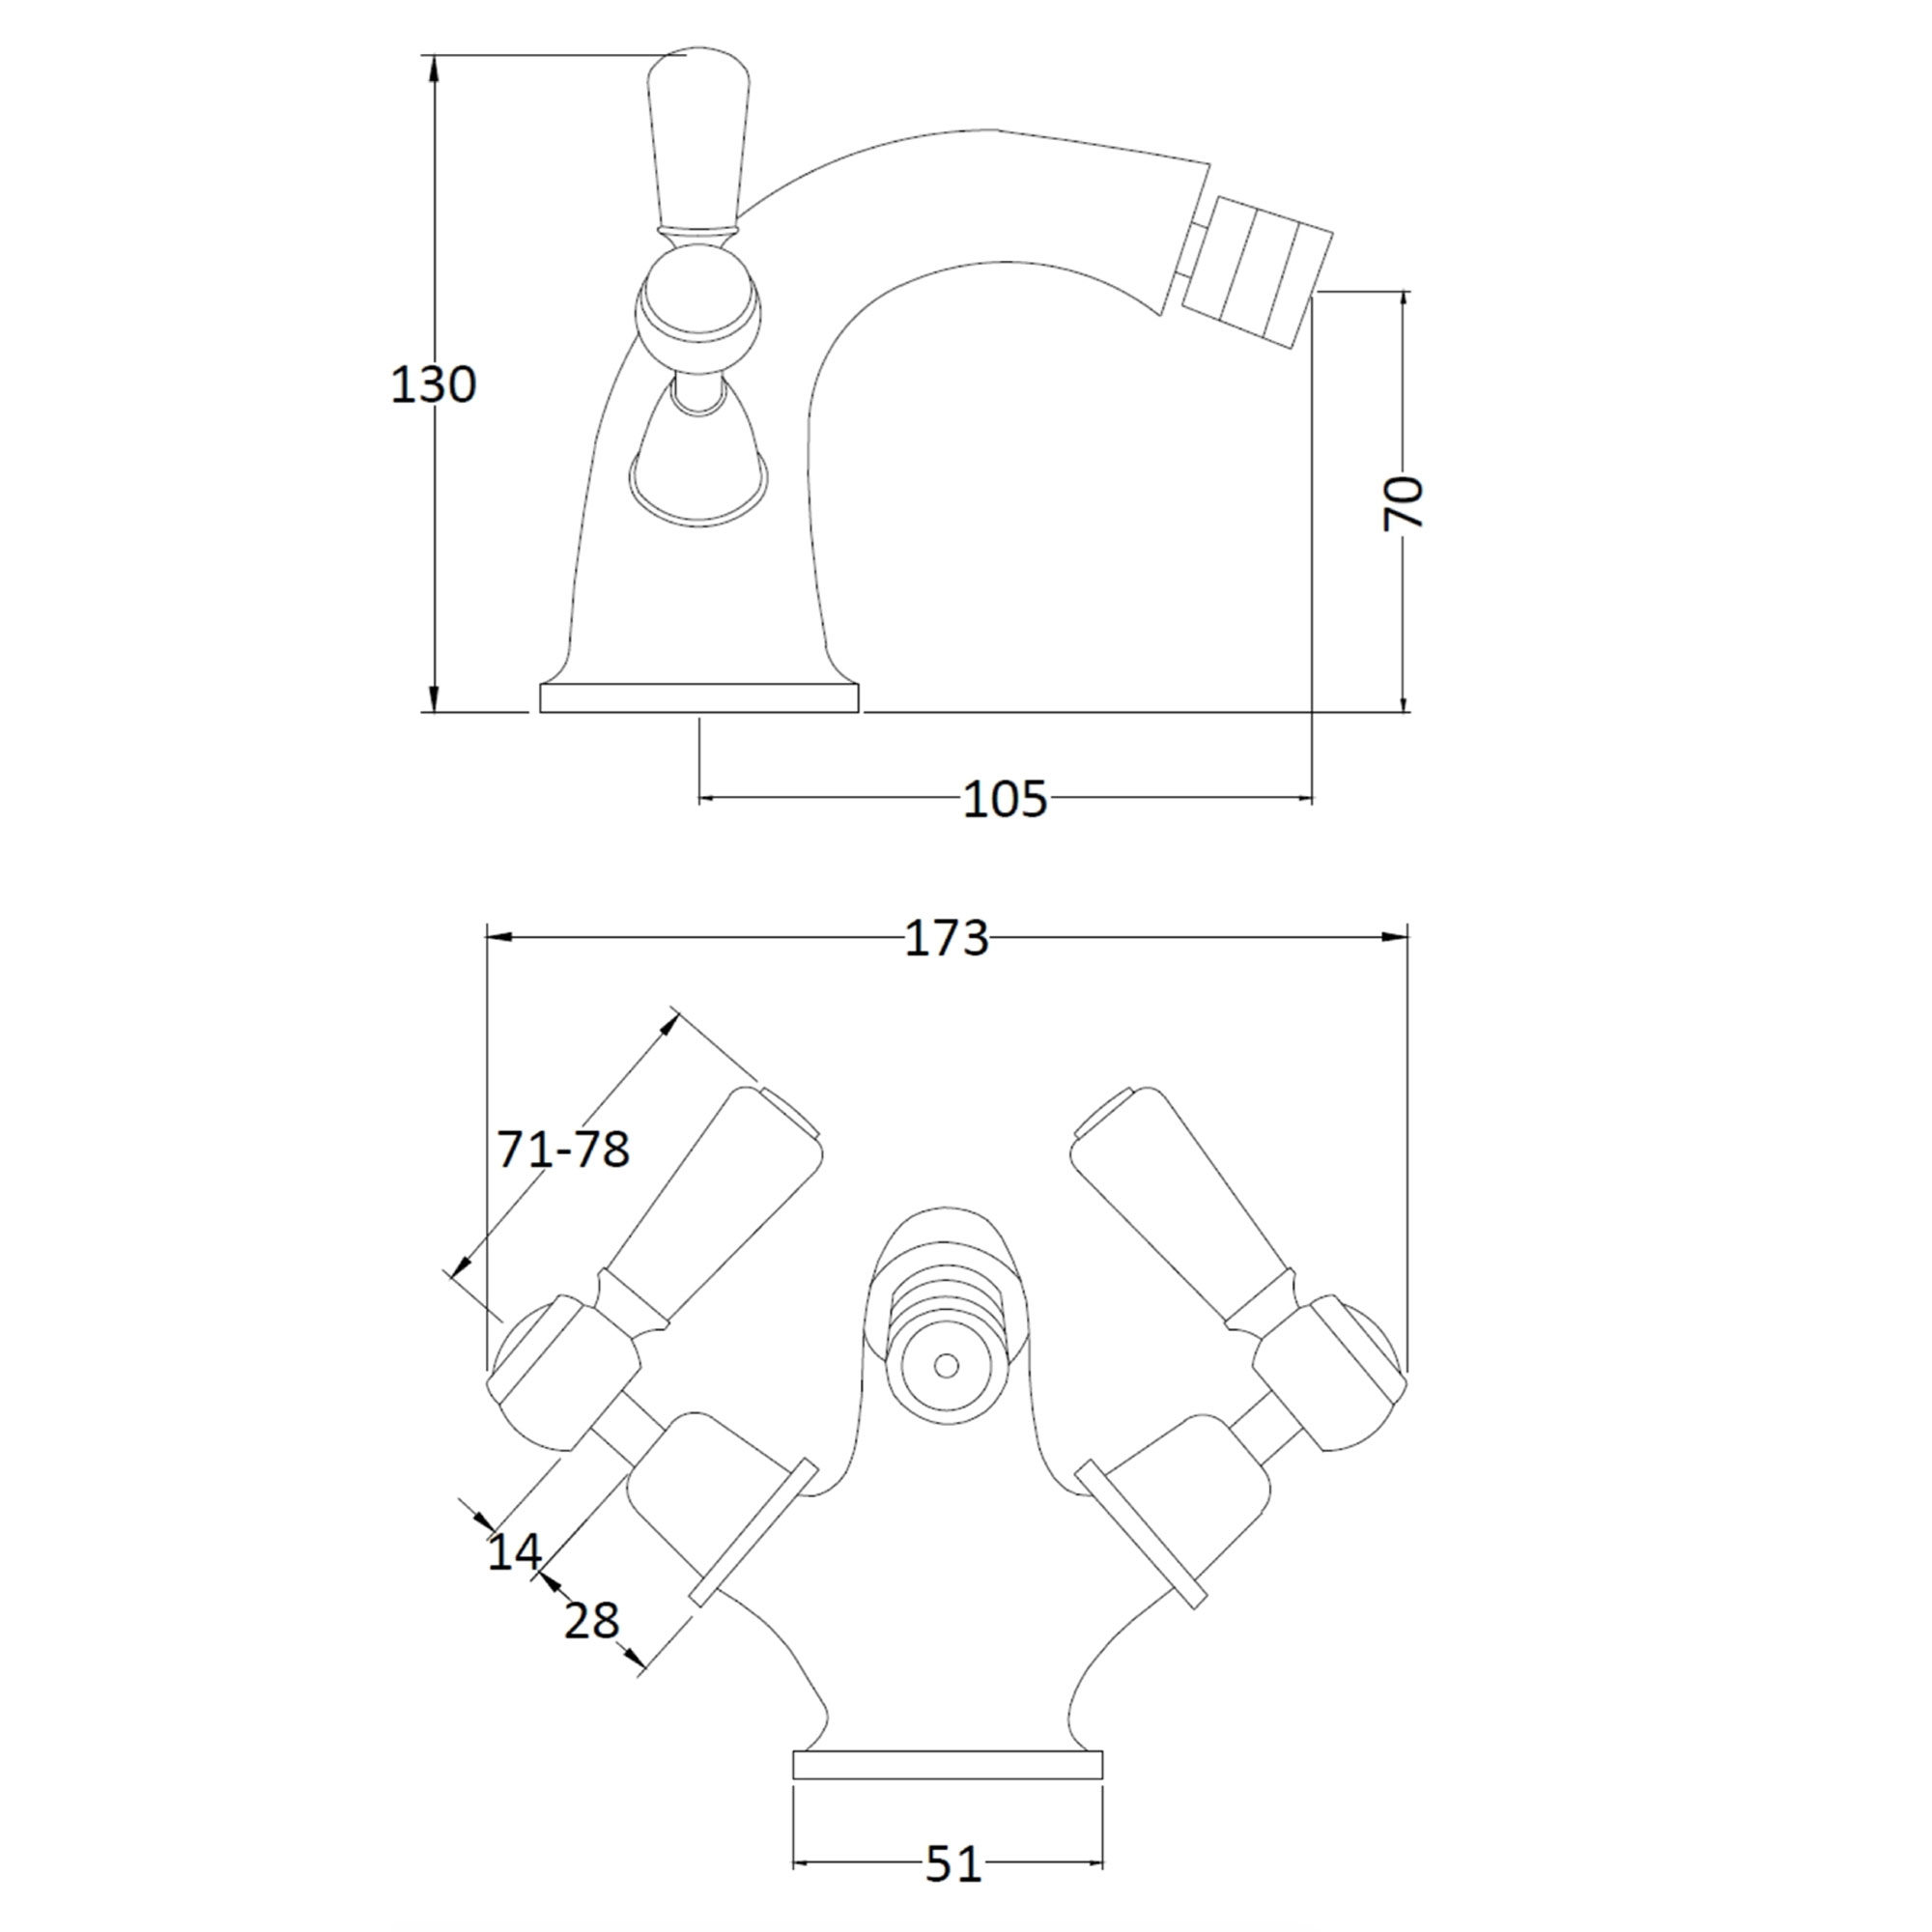 Victrion Mono Bidet Lever Mixer Technical Bathwaters